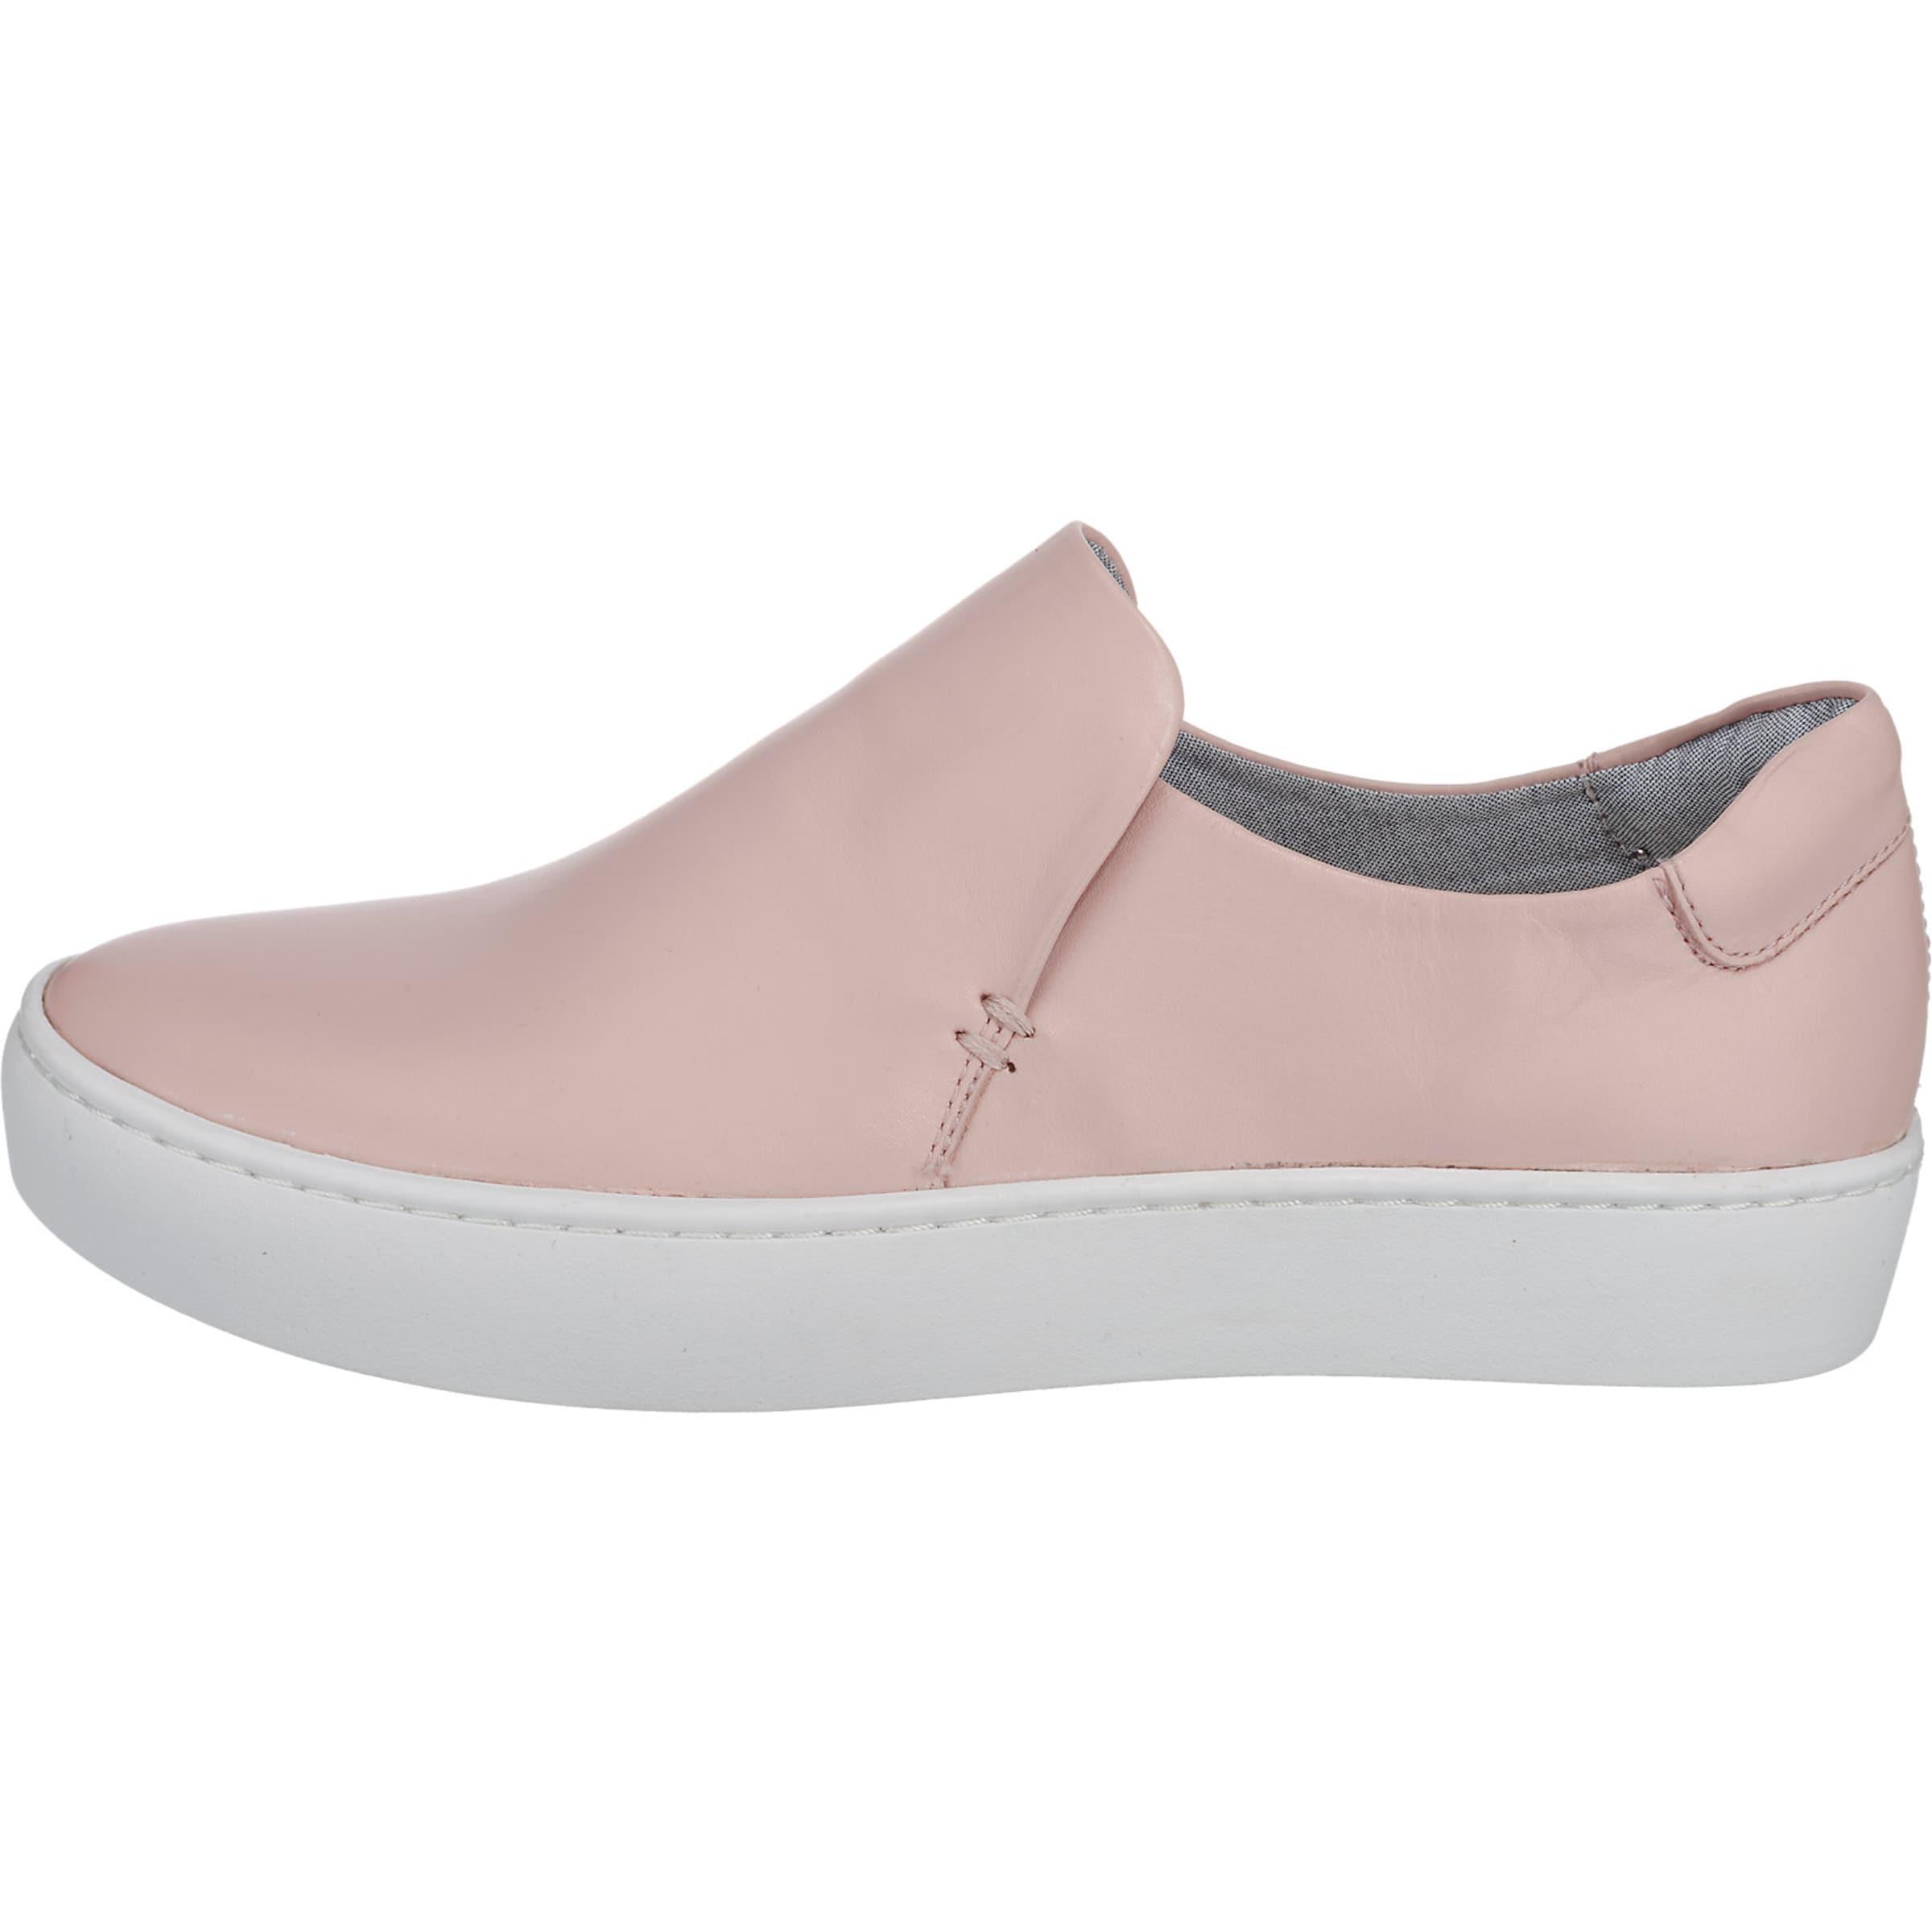 Billiger Großhandel VAGABOND SHOEMAKERS Sneaker 'Zoe' Rabatt Großer Rabatt Besuchen Neue Online LbdOS